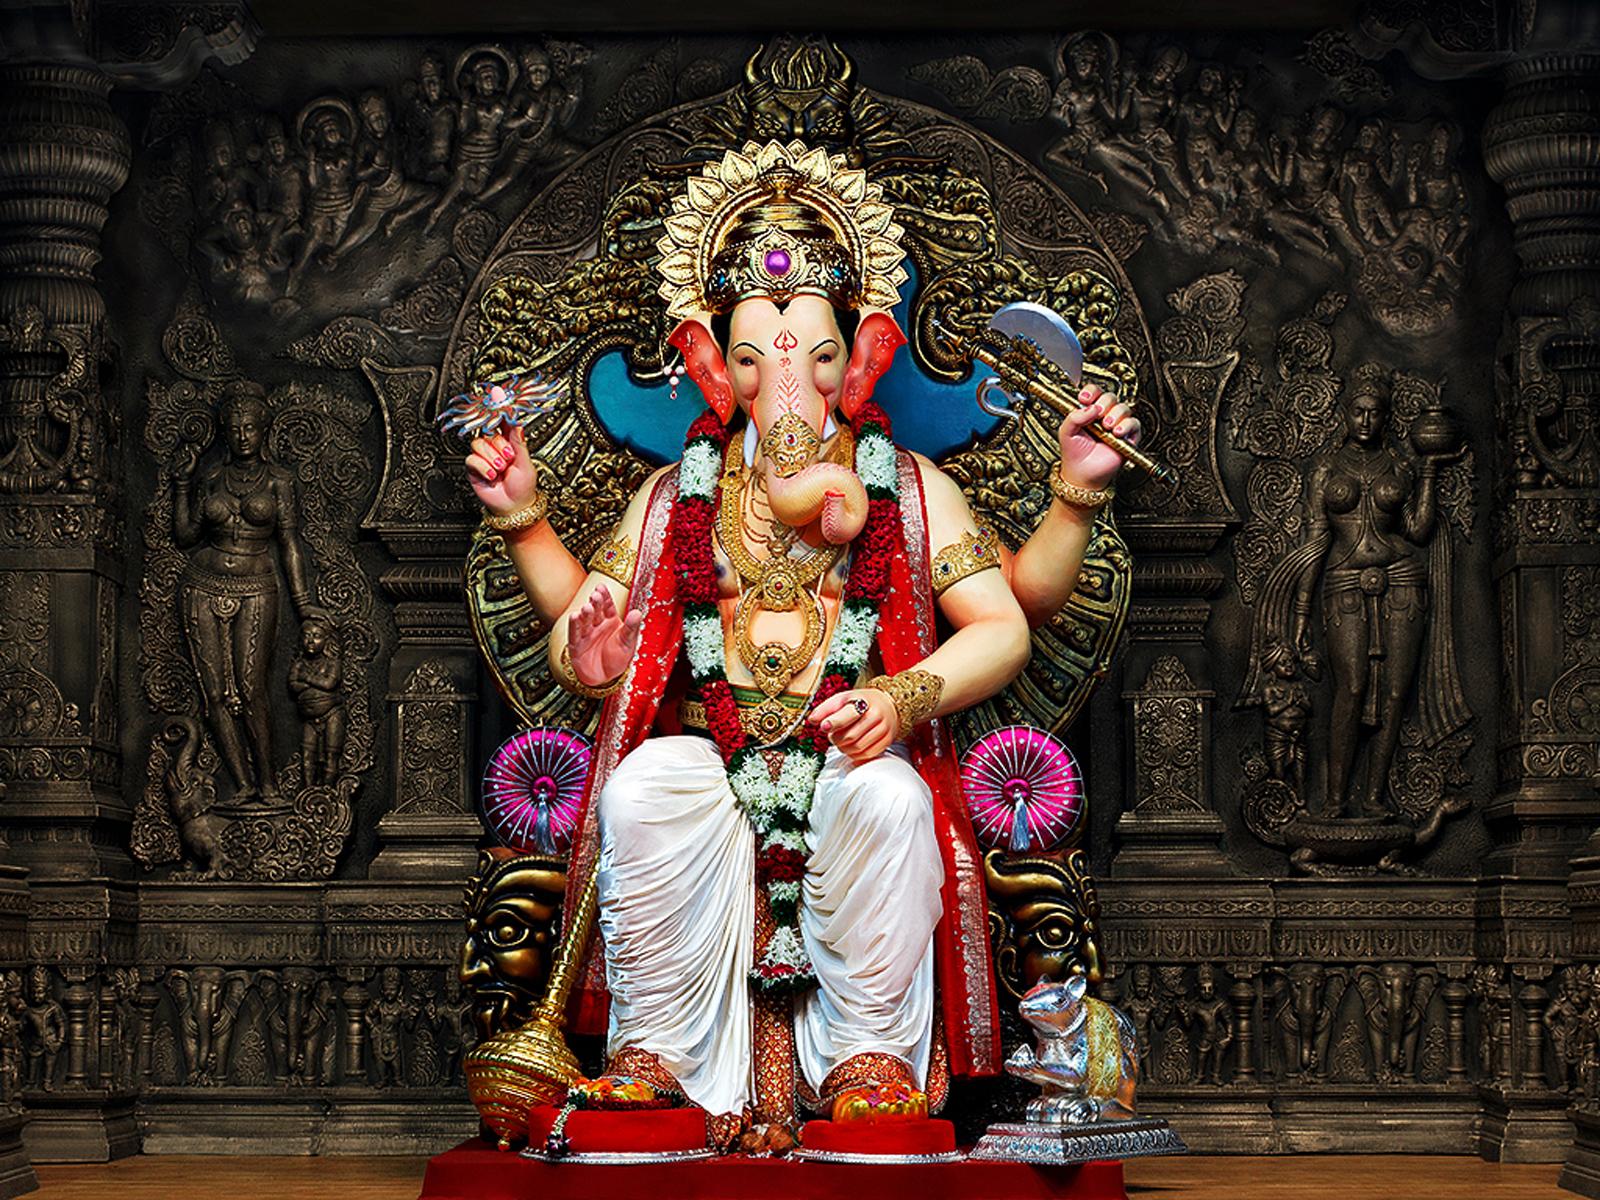 Lord Ganesha Hd Images Free Downloads For Wedding Cards: Mix Masala: November 2012